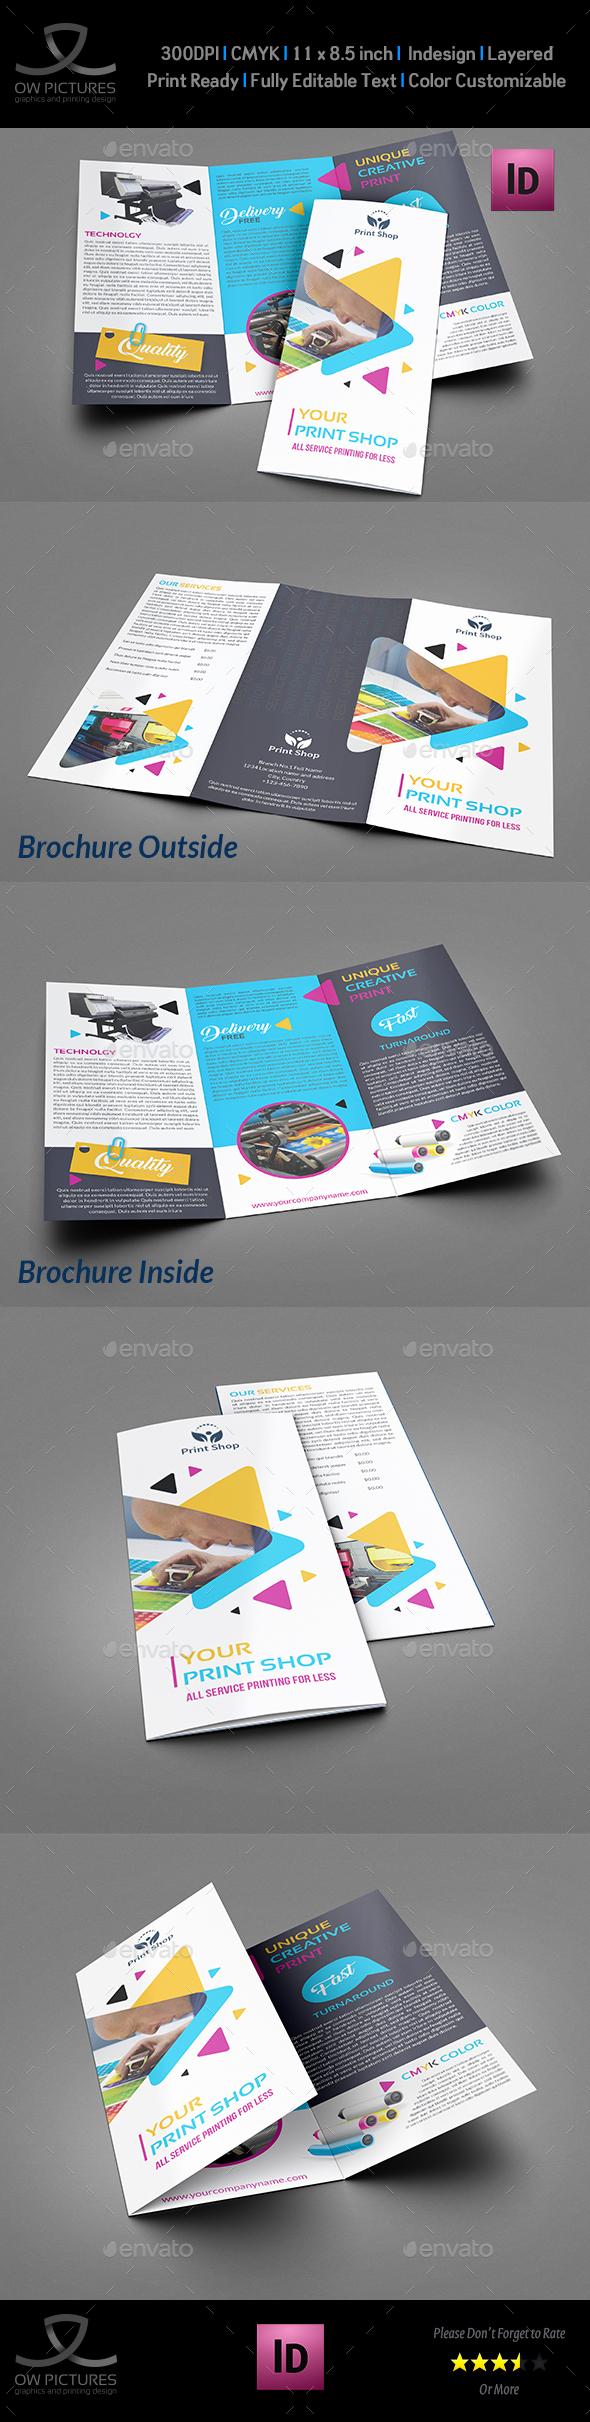 print shop tri fold brochure template brochures print templates